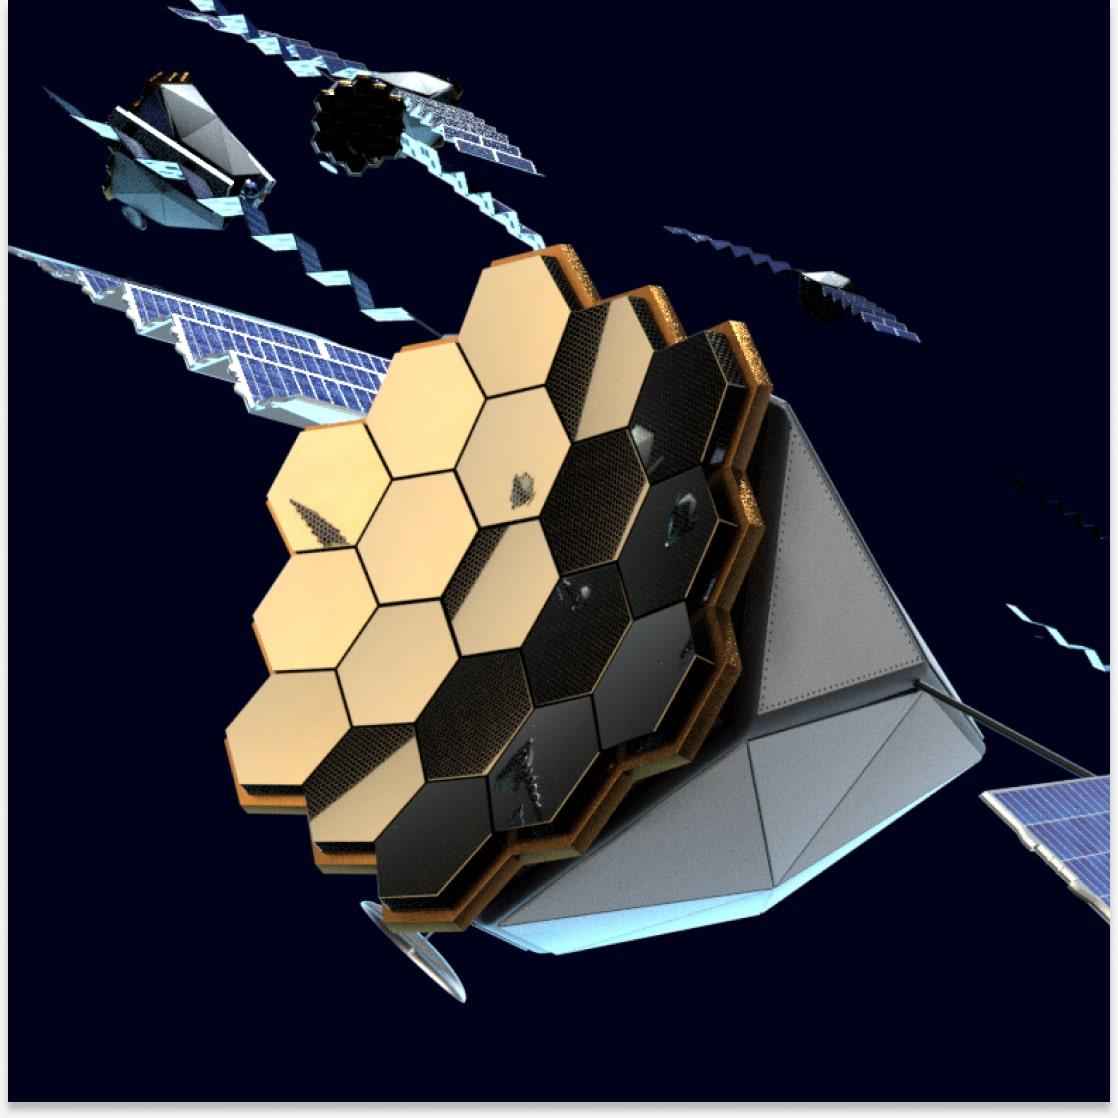 Render of the satellite